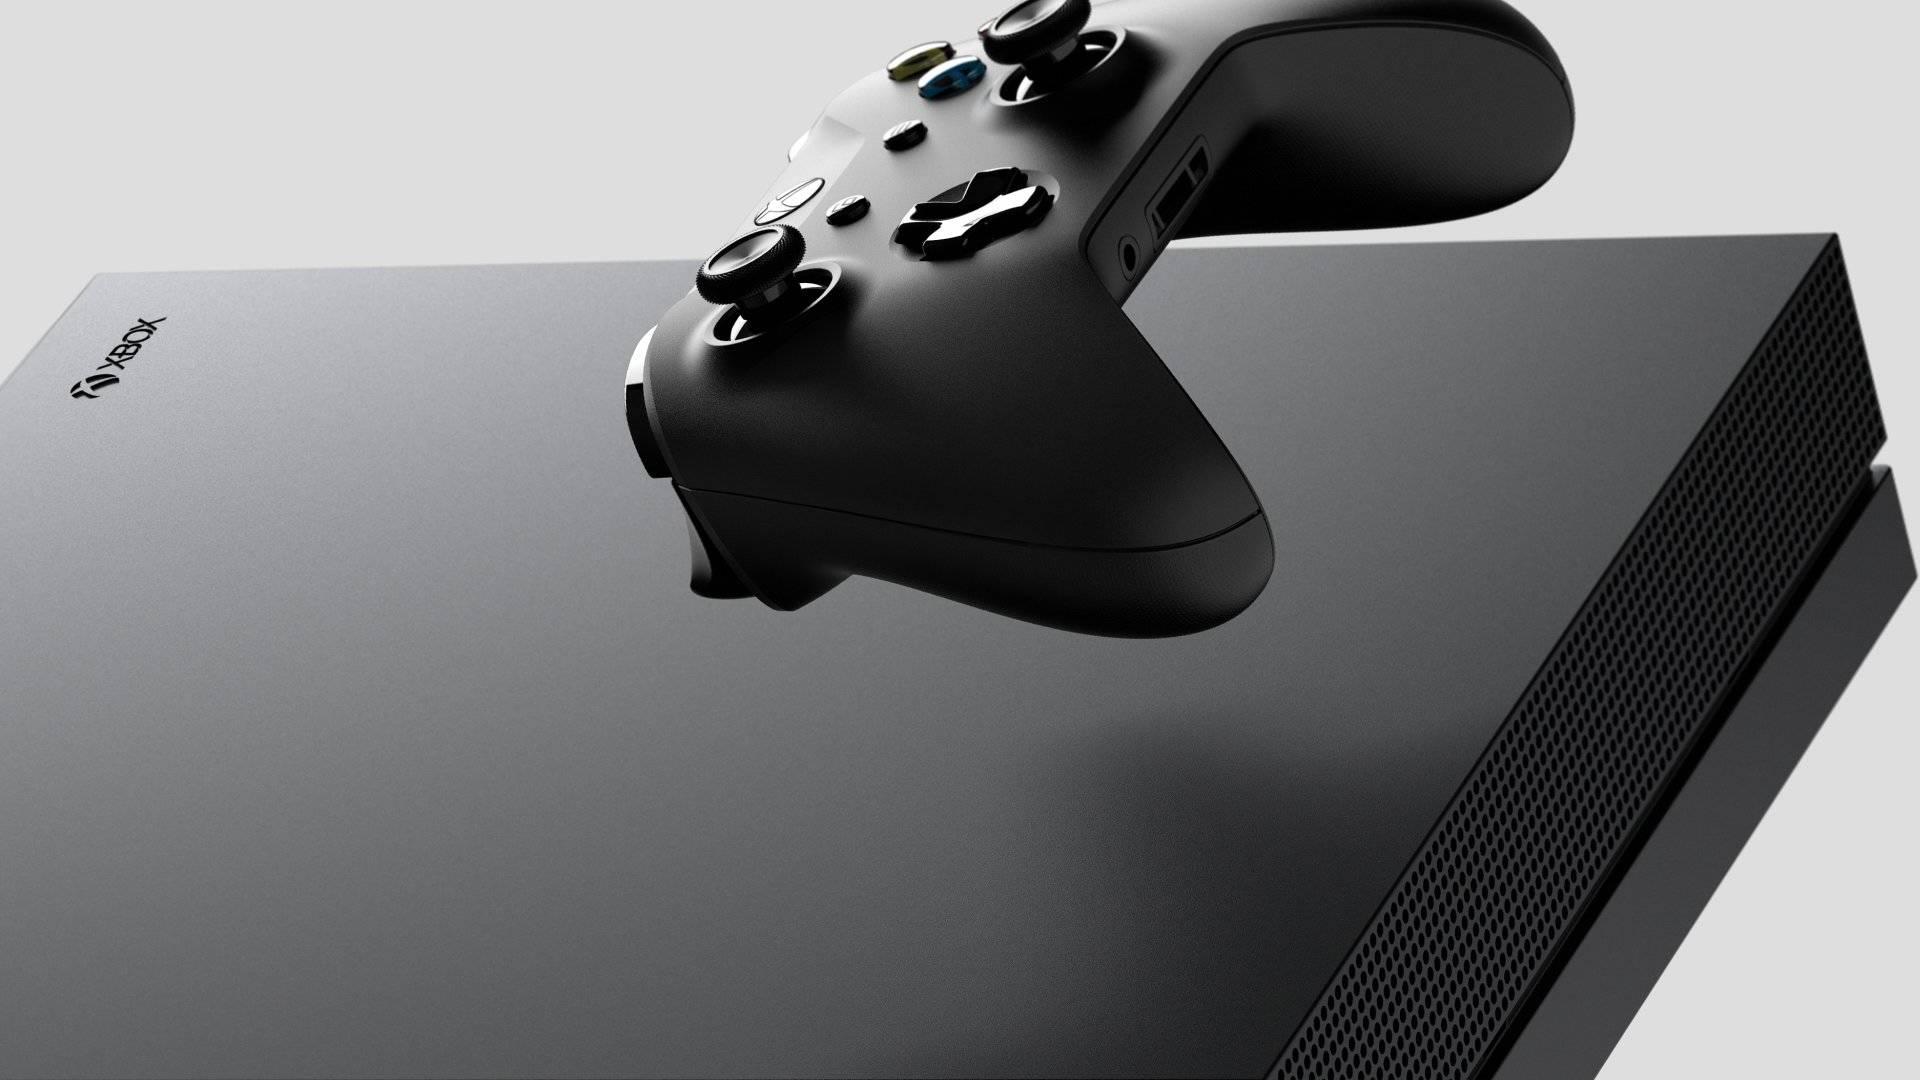 Xbox One - Console 0001